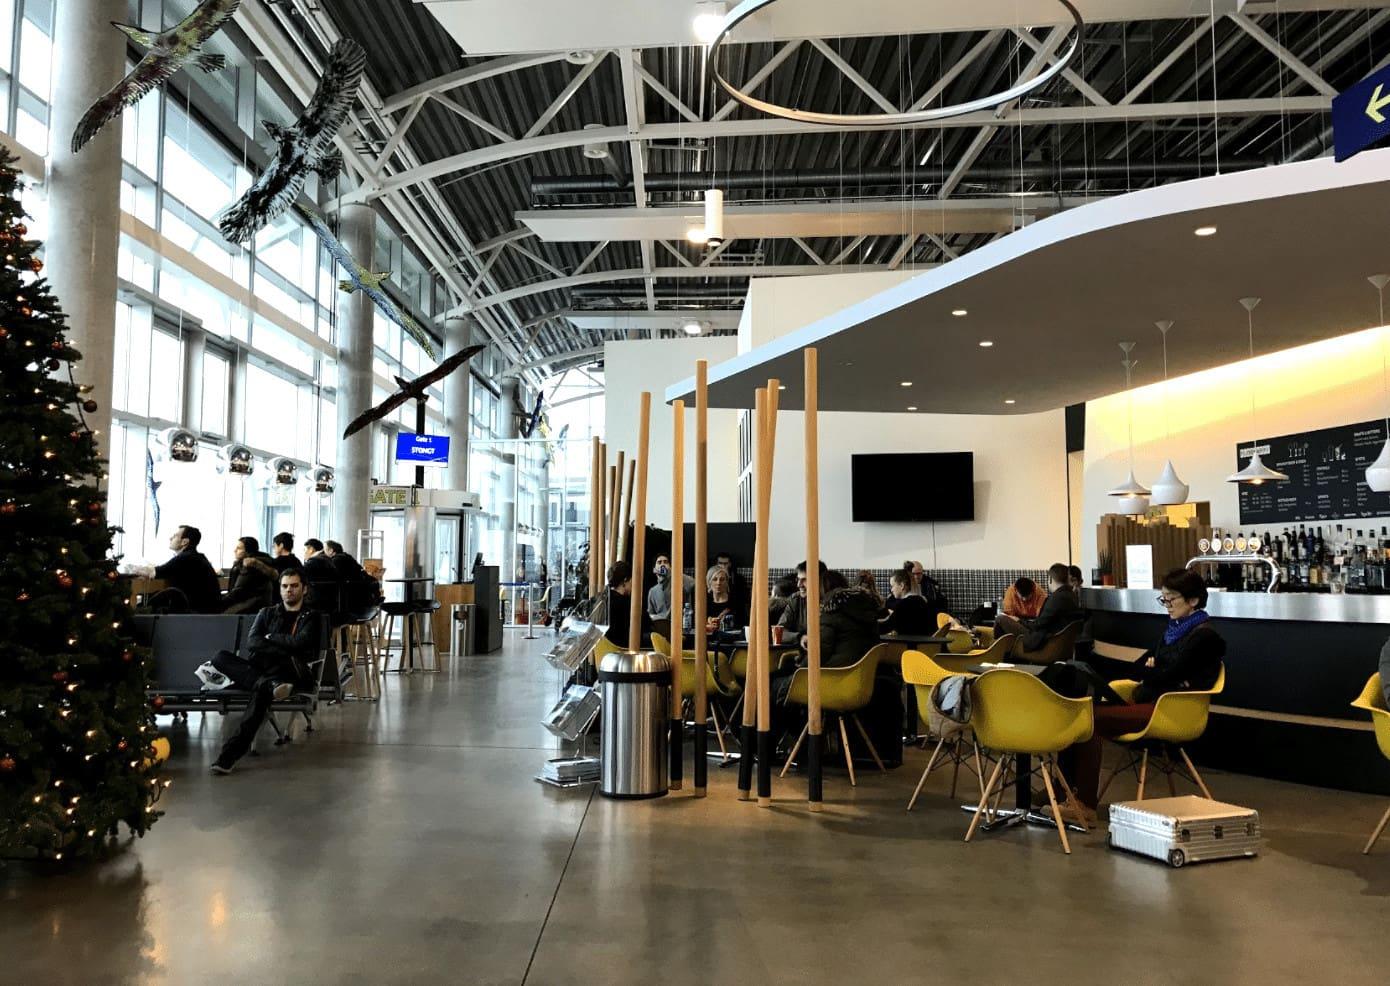 Vagar Airport departures hall